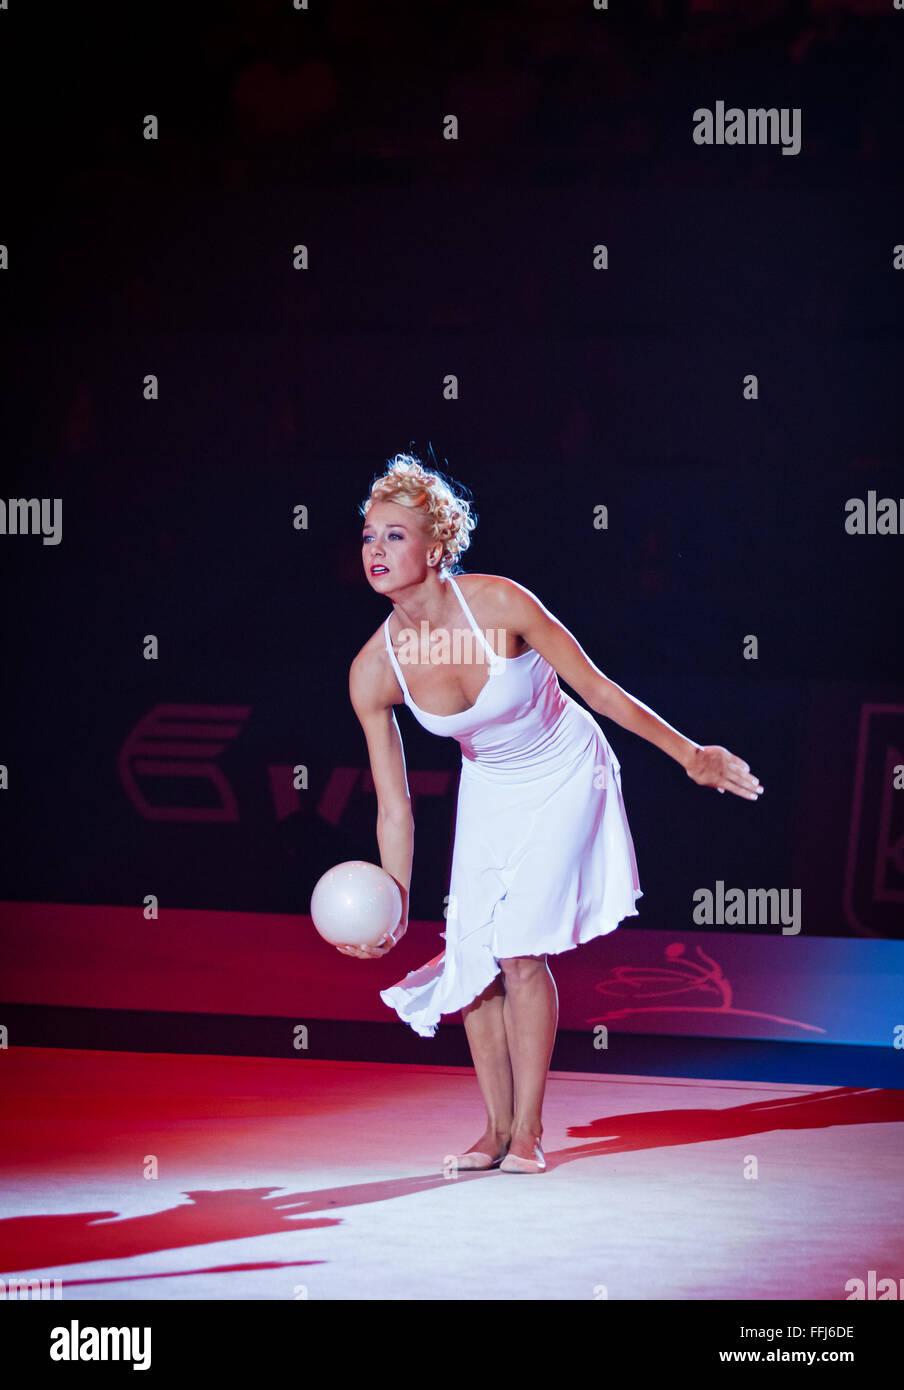 KYIV, UKRAINE - SEPTEMBER 1, 2013: Natalia Godunko, former Ukrainian gymnast performs during Gala concert at 32nd - Stock Image